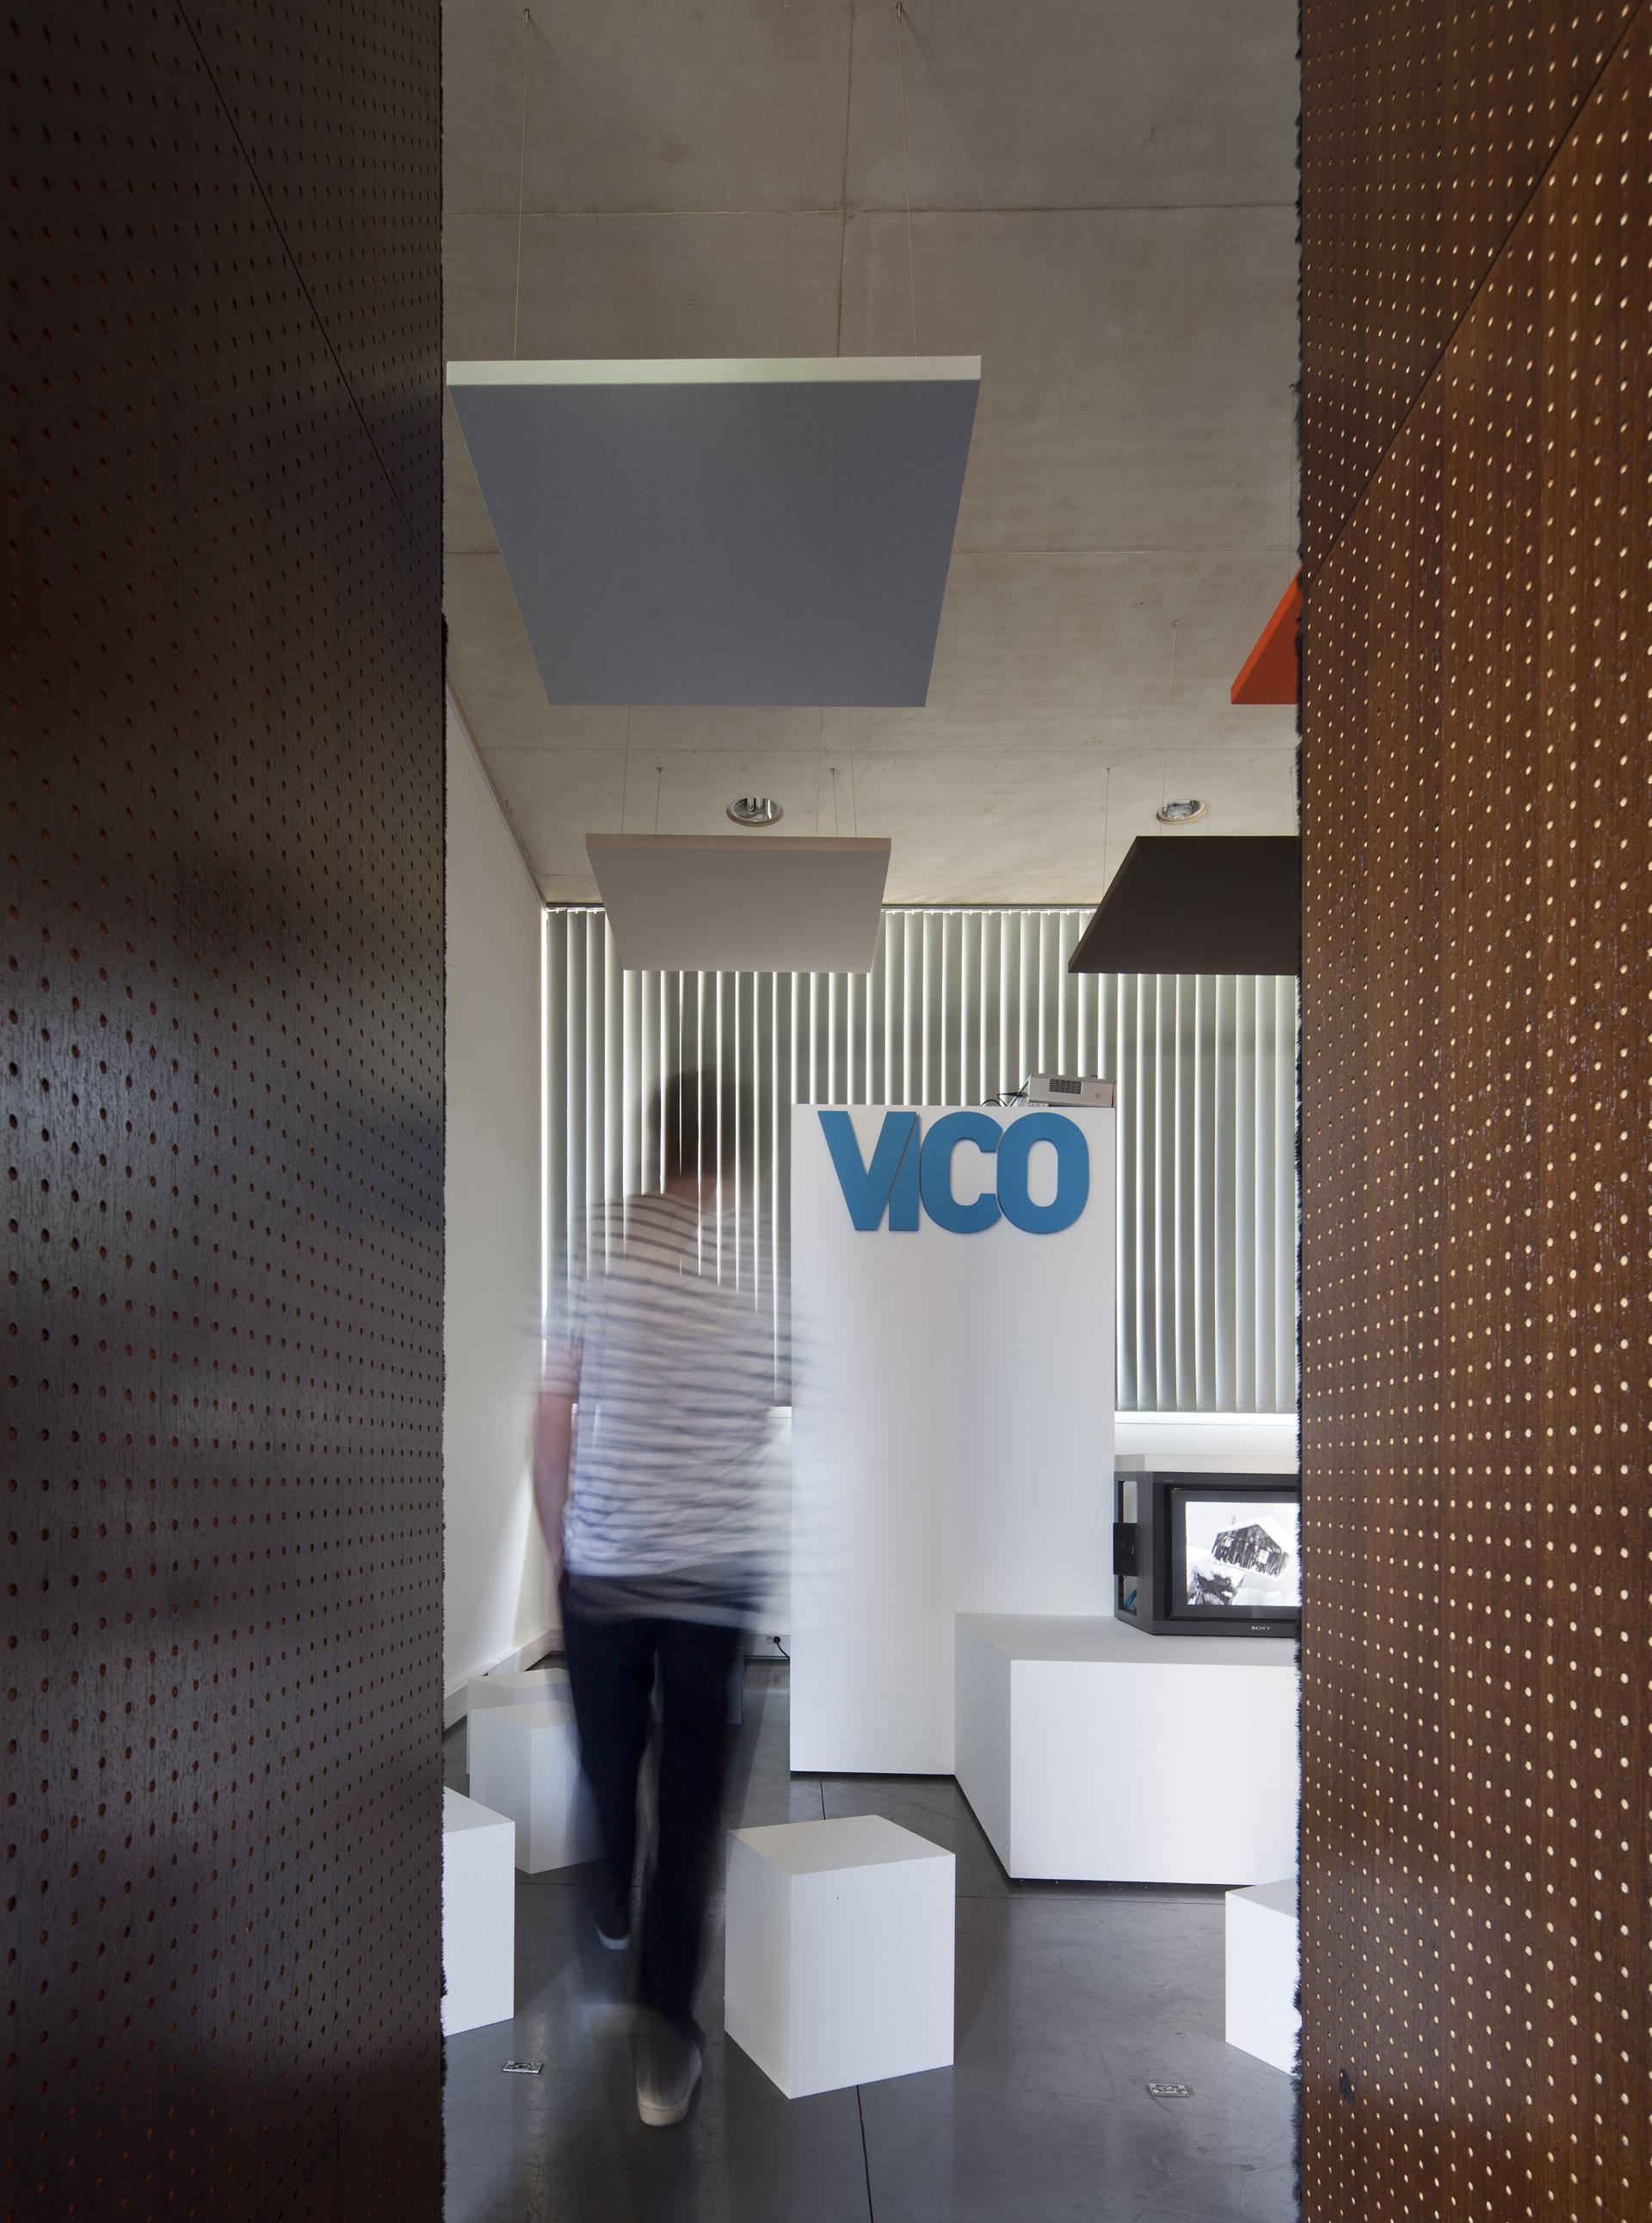 VICO_009.jpg